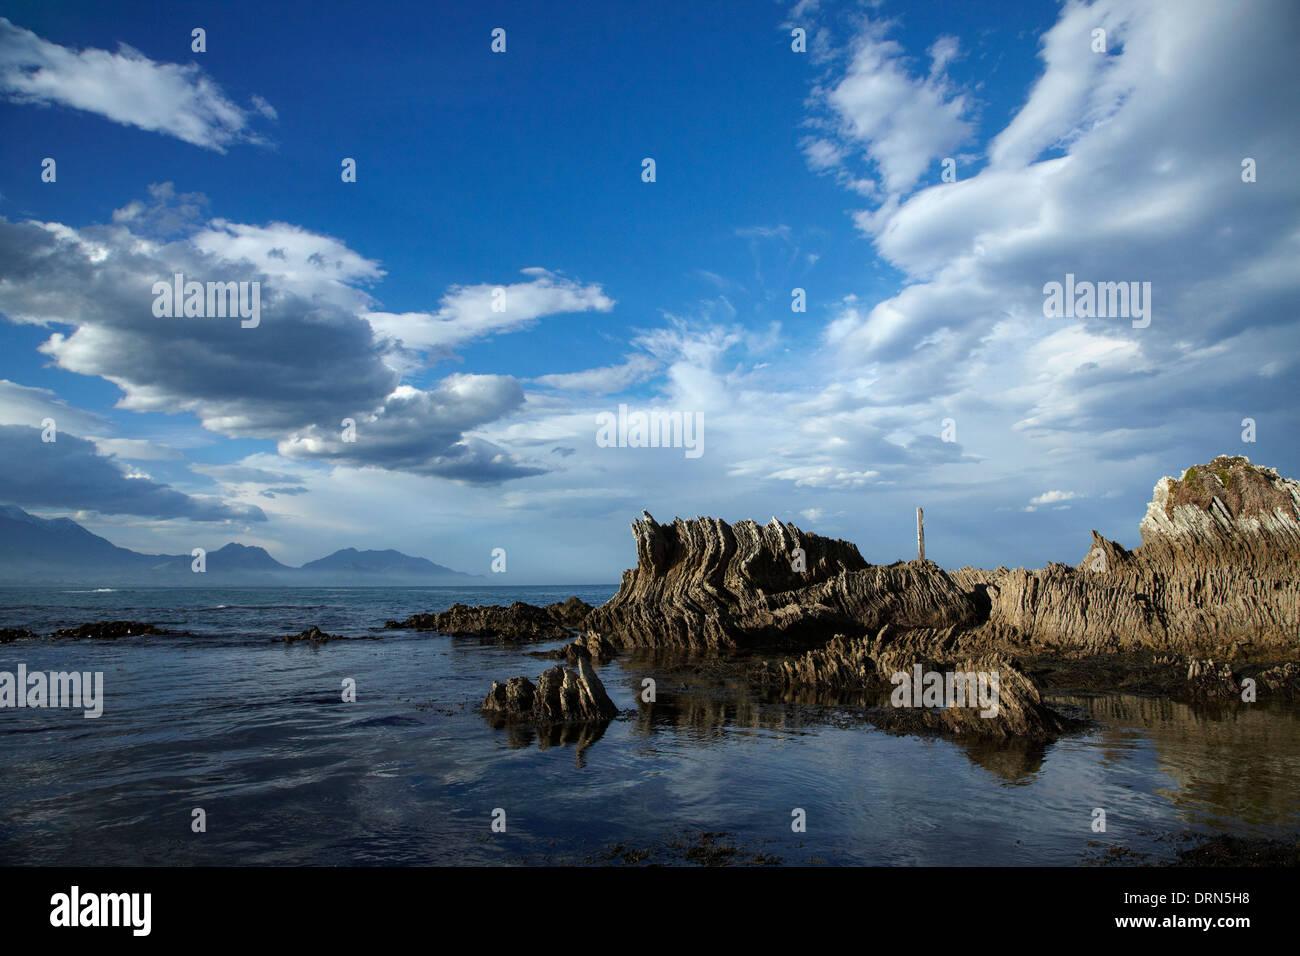 Seaward Kaikoura Ranges and unusual coastal folded rock formations, Kaikoura, South Island, New Zealand - Stock Image